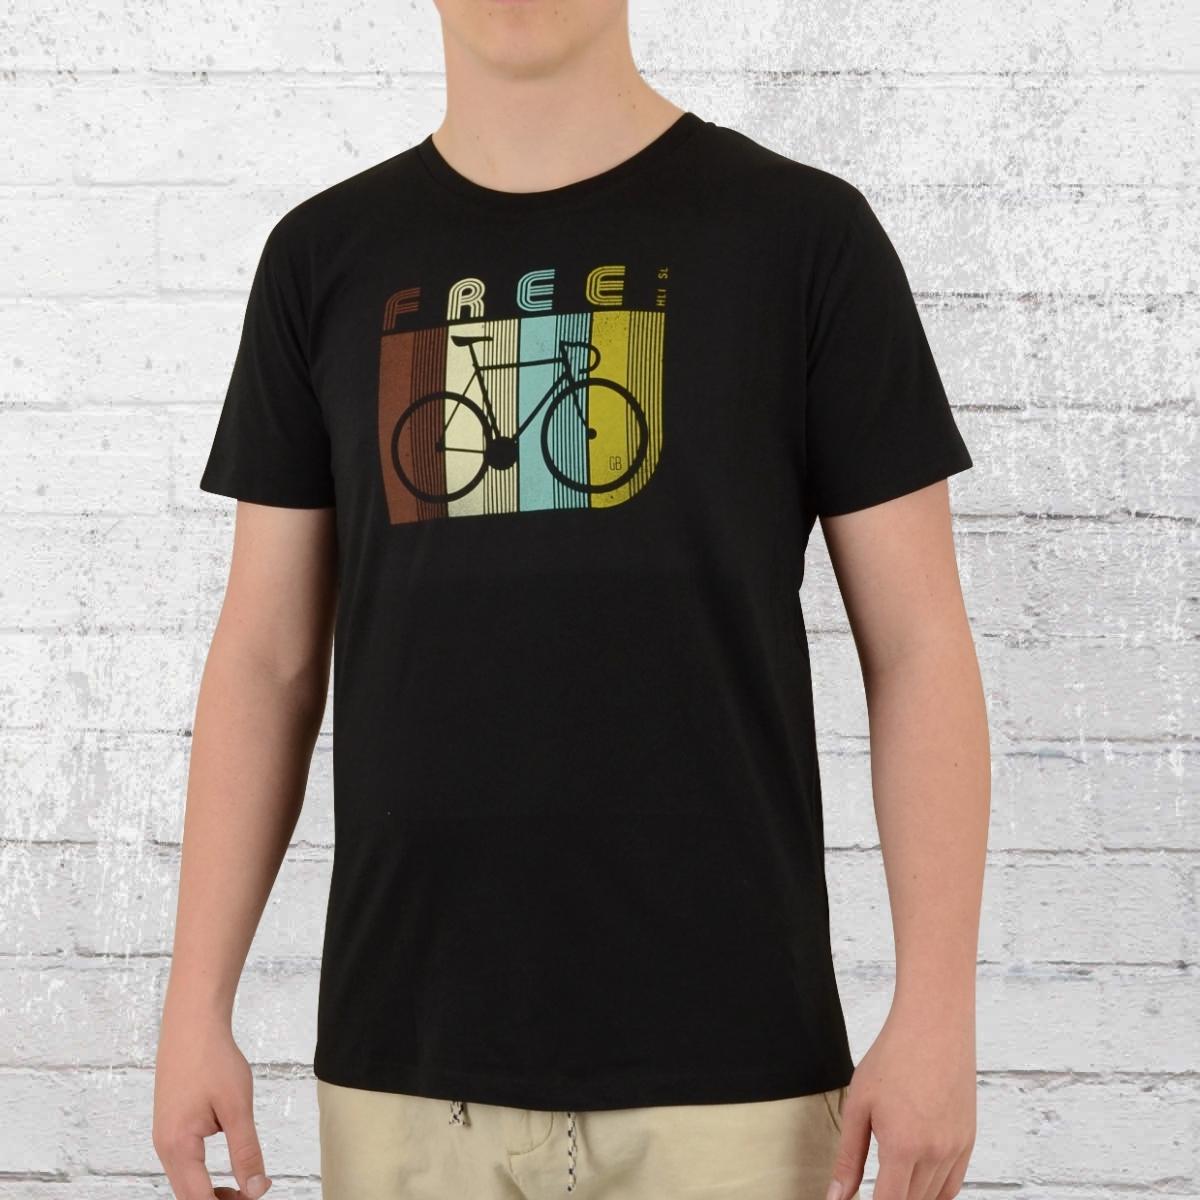 Greenbomb Männer Rennrad T-Shirt Bike Retro Stripes schwarz